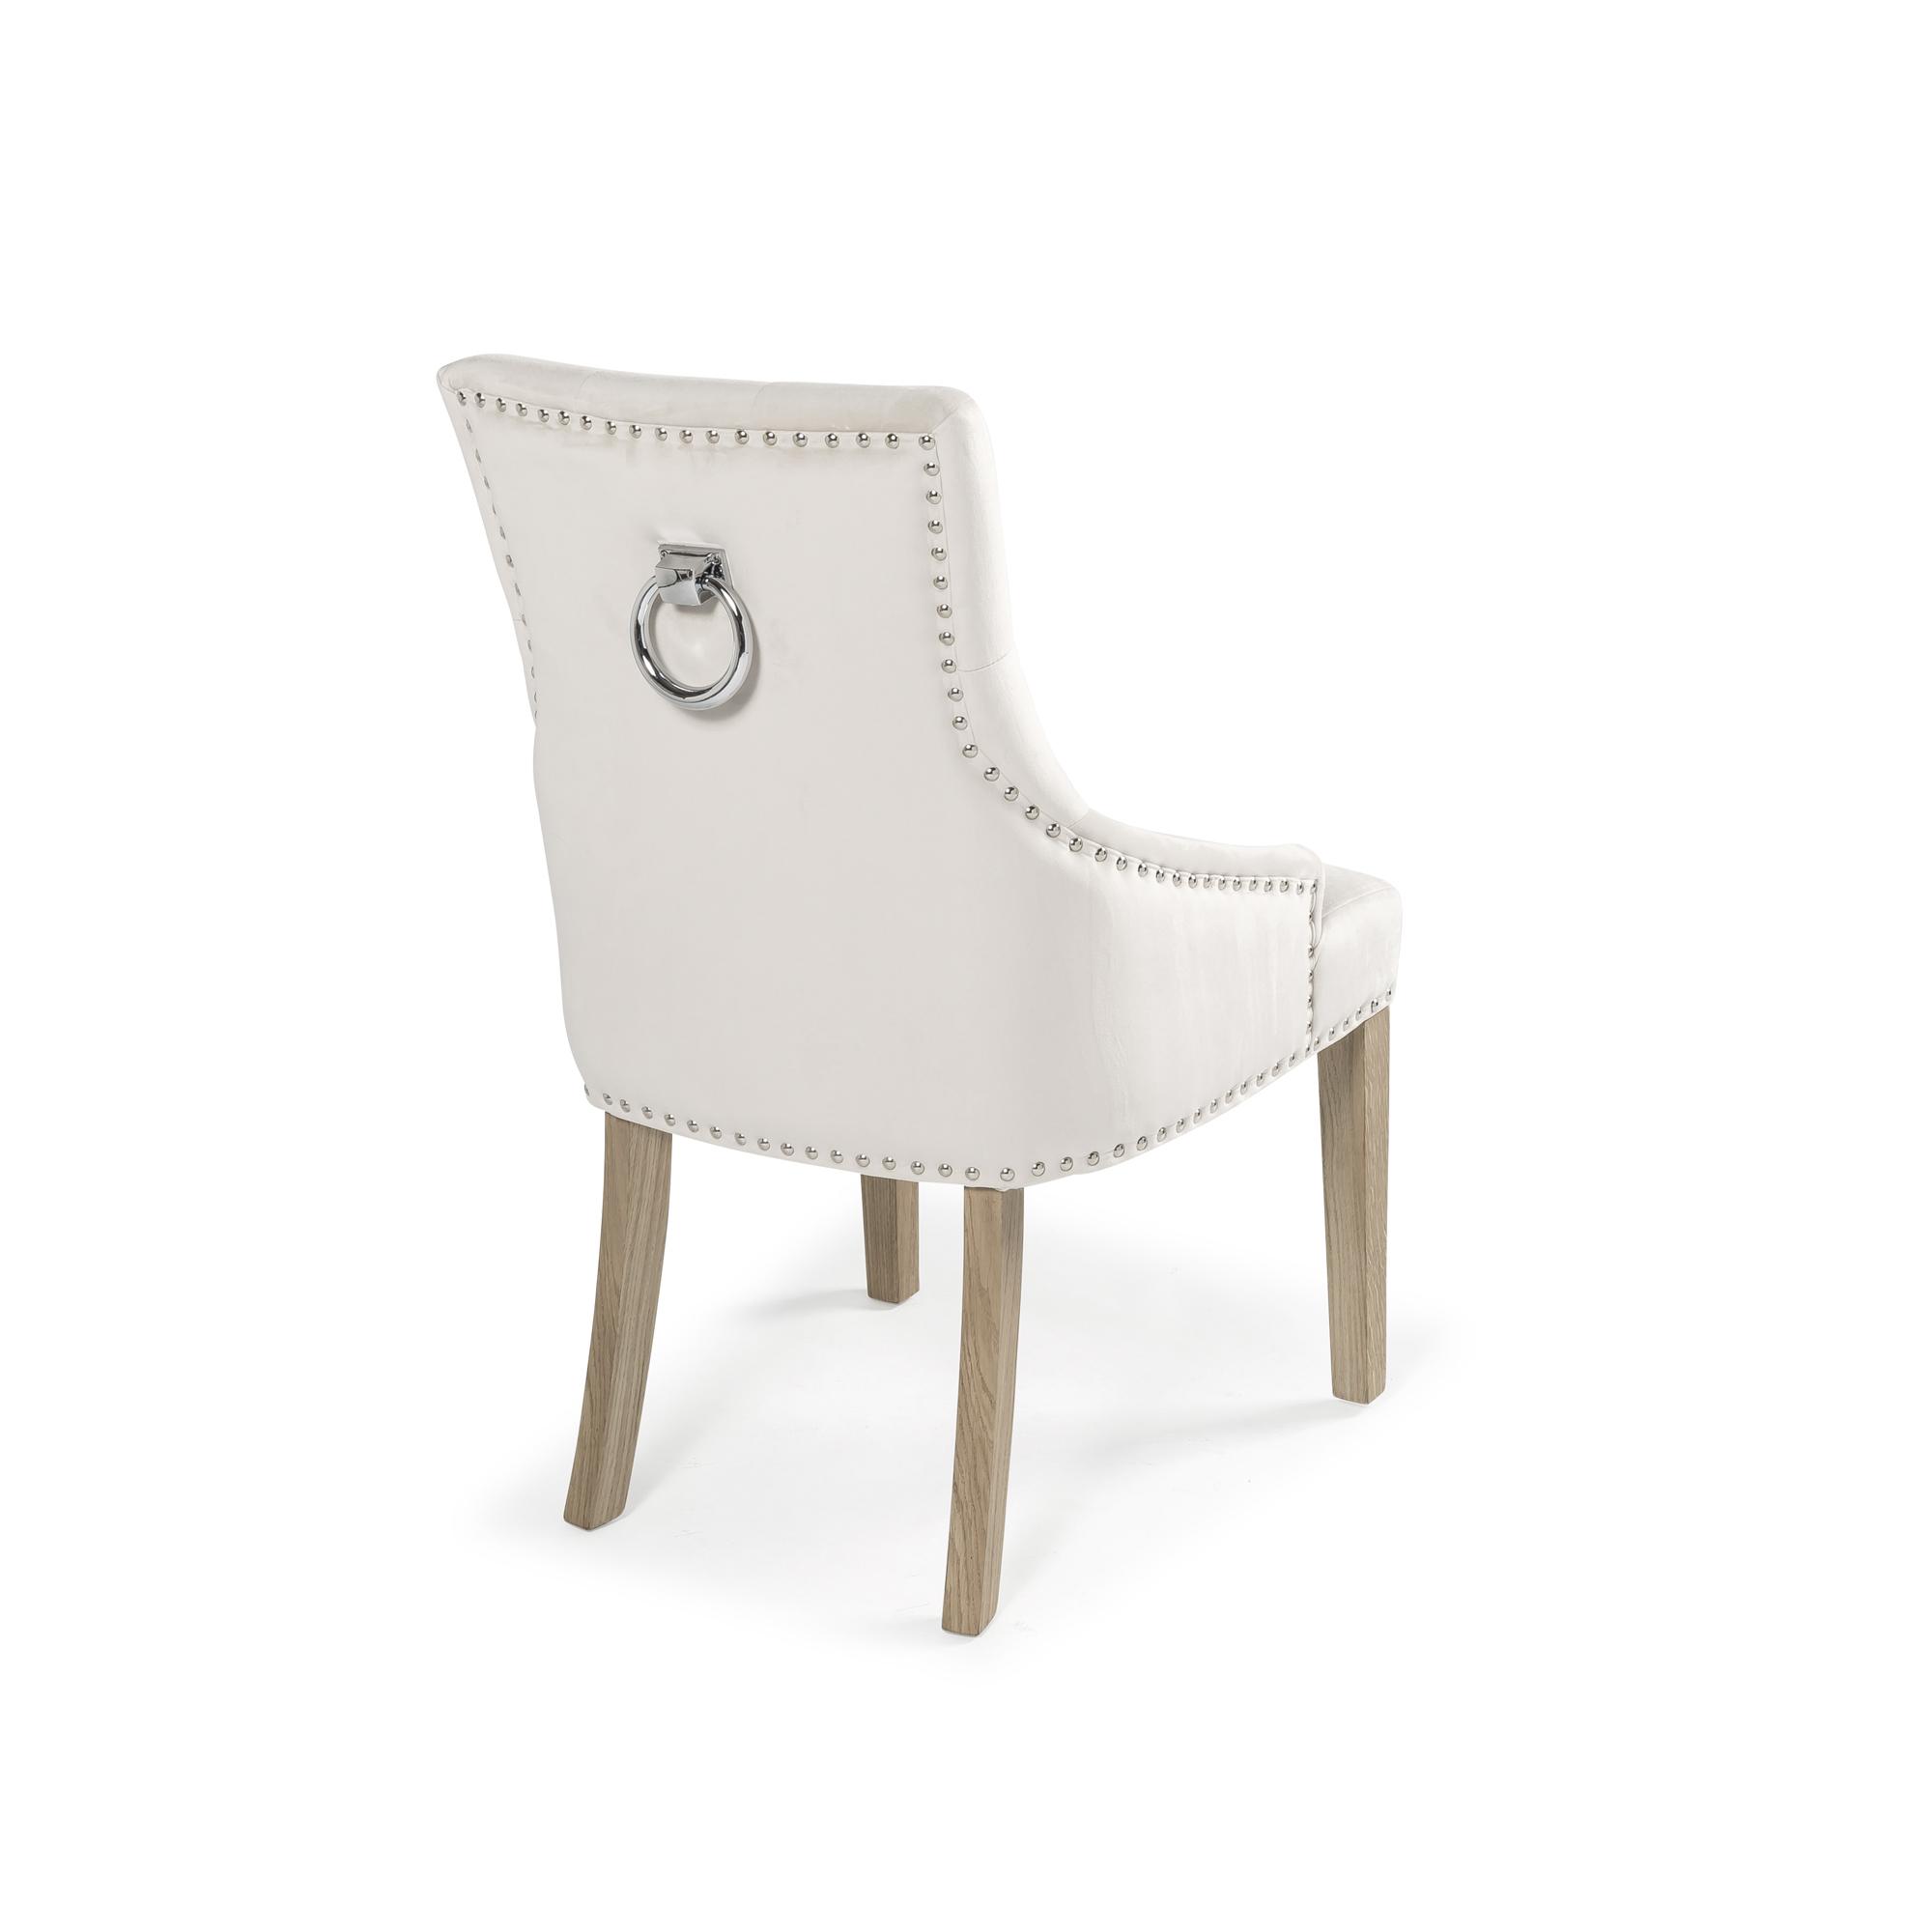 Chelsea Cream Brushed Velvet Upholstered Scoop Back Dining Chair with Stainless Steel Hoop, Studs & Oak Legs